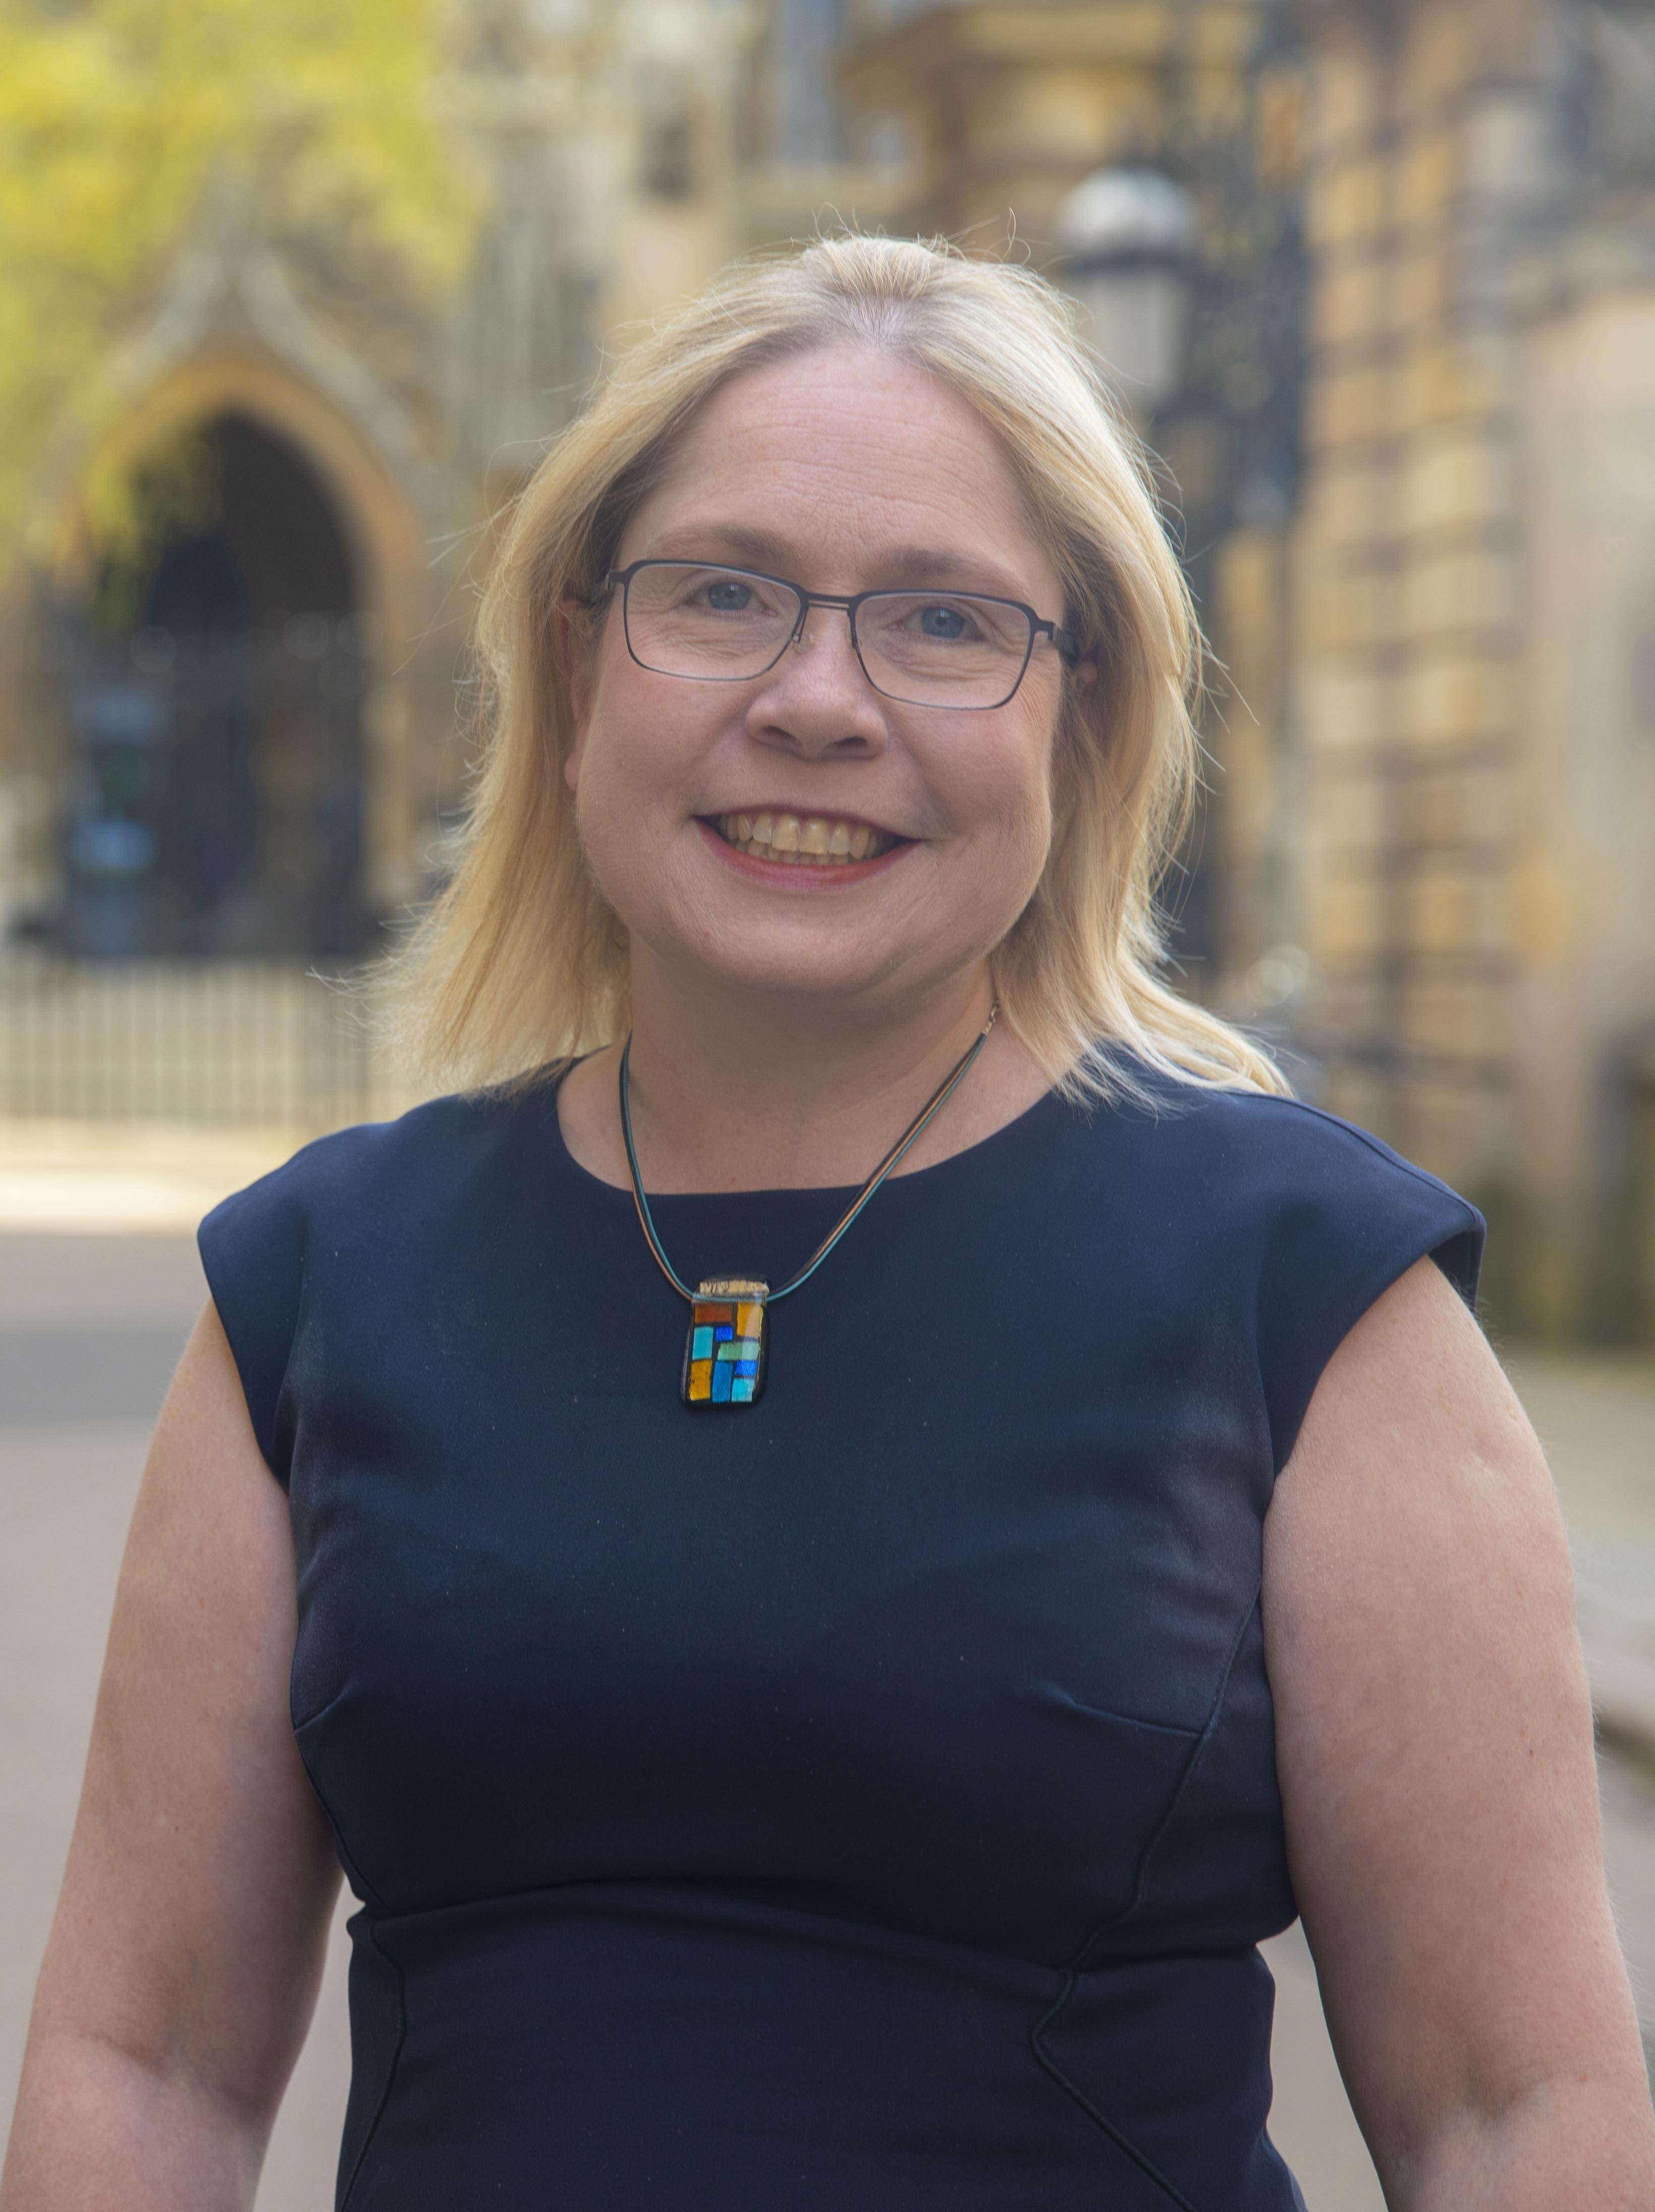 Kirsty Allen of Cambridge University Library